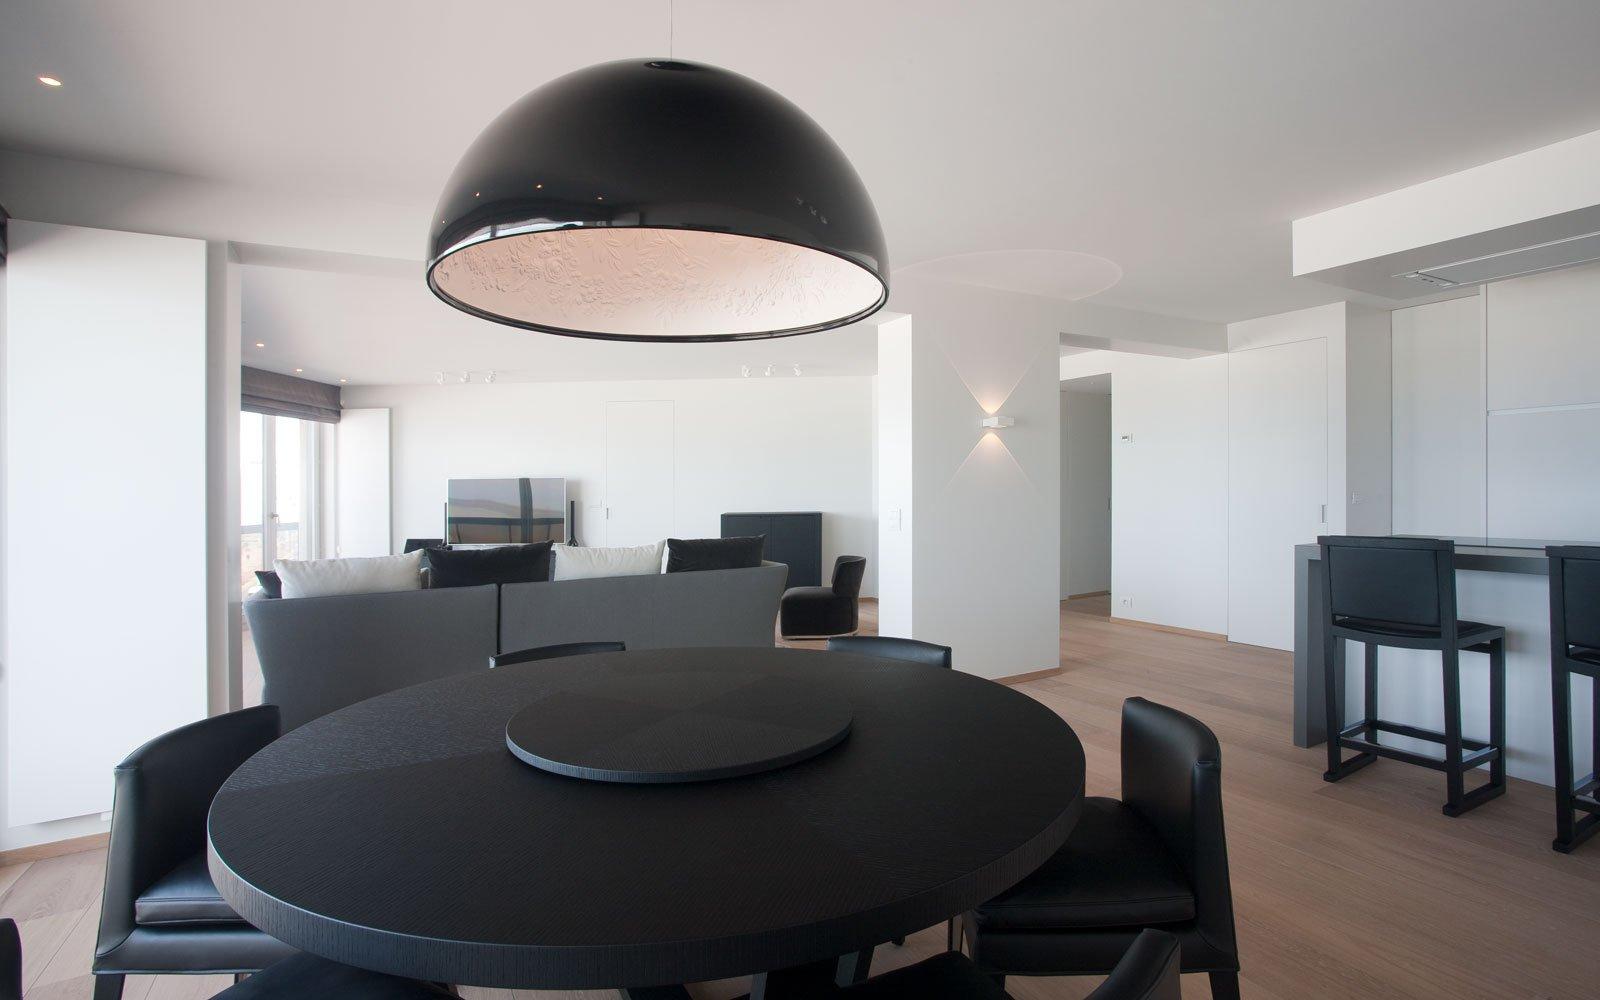 Appartement, woonkamer, sfeervol, ronde tafel, parketvloer, De Voogt Parket, droomappartement, Stephan Gunst